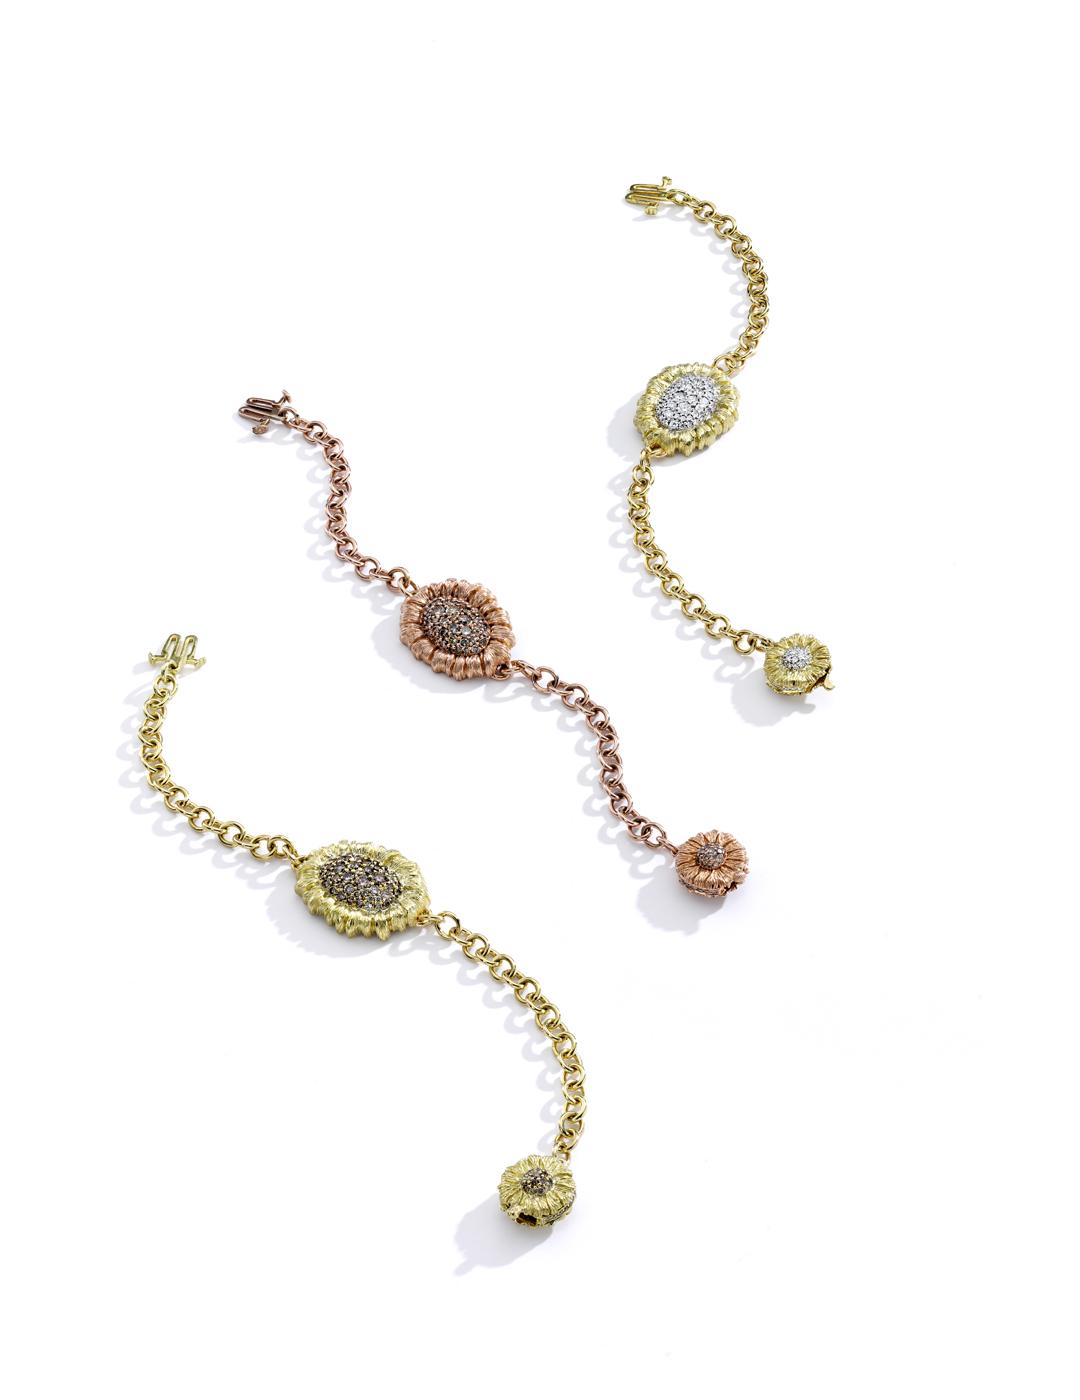 mish_jewelry_product_Nigella-OvlChrm-SingleBrwn-2